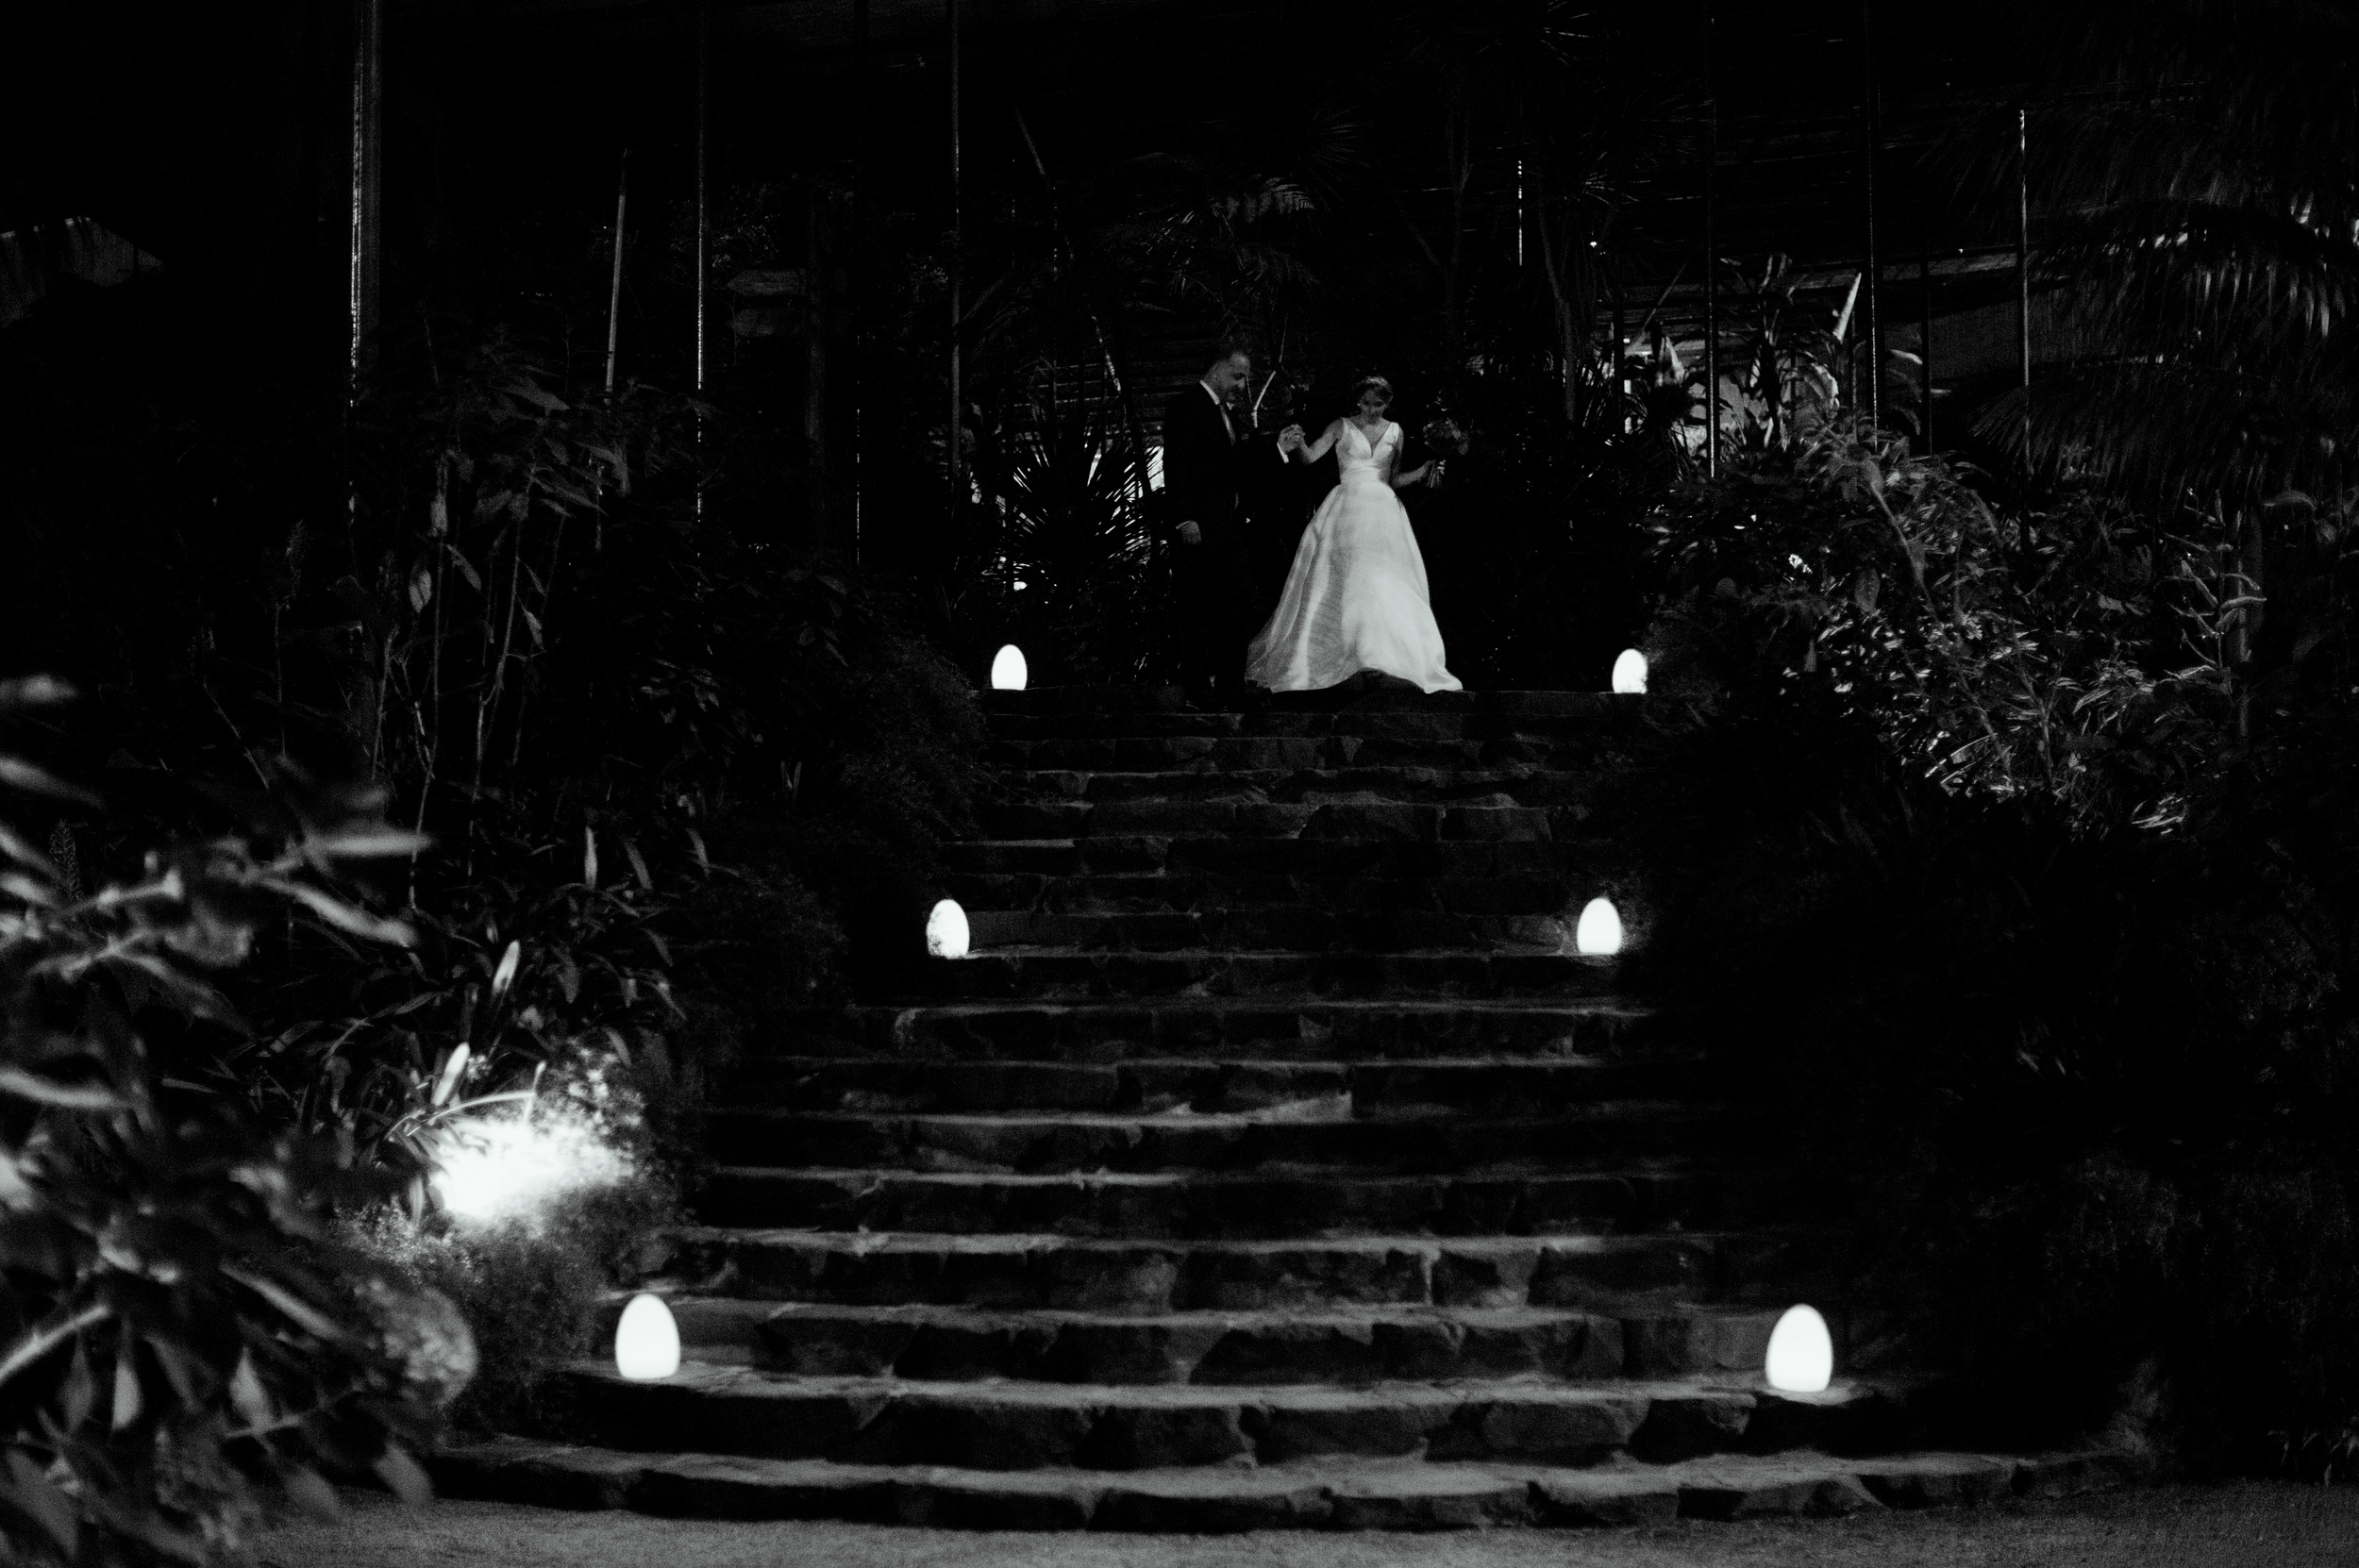 mariarao+wedding+estufa+fria-257.jpg